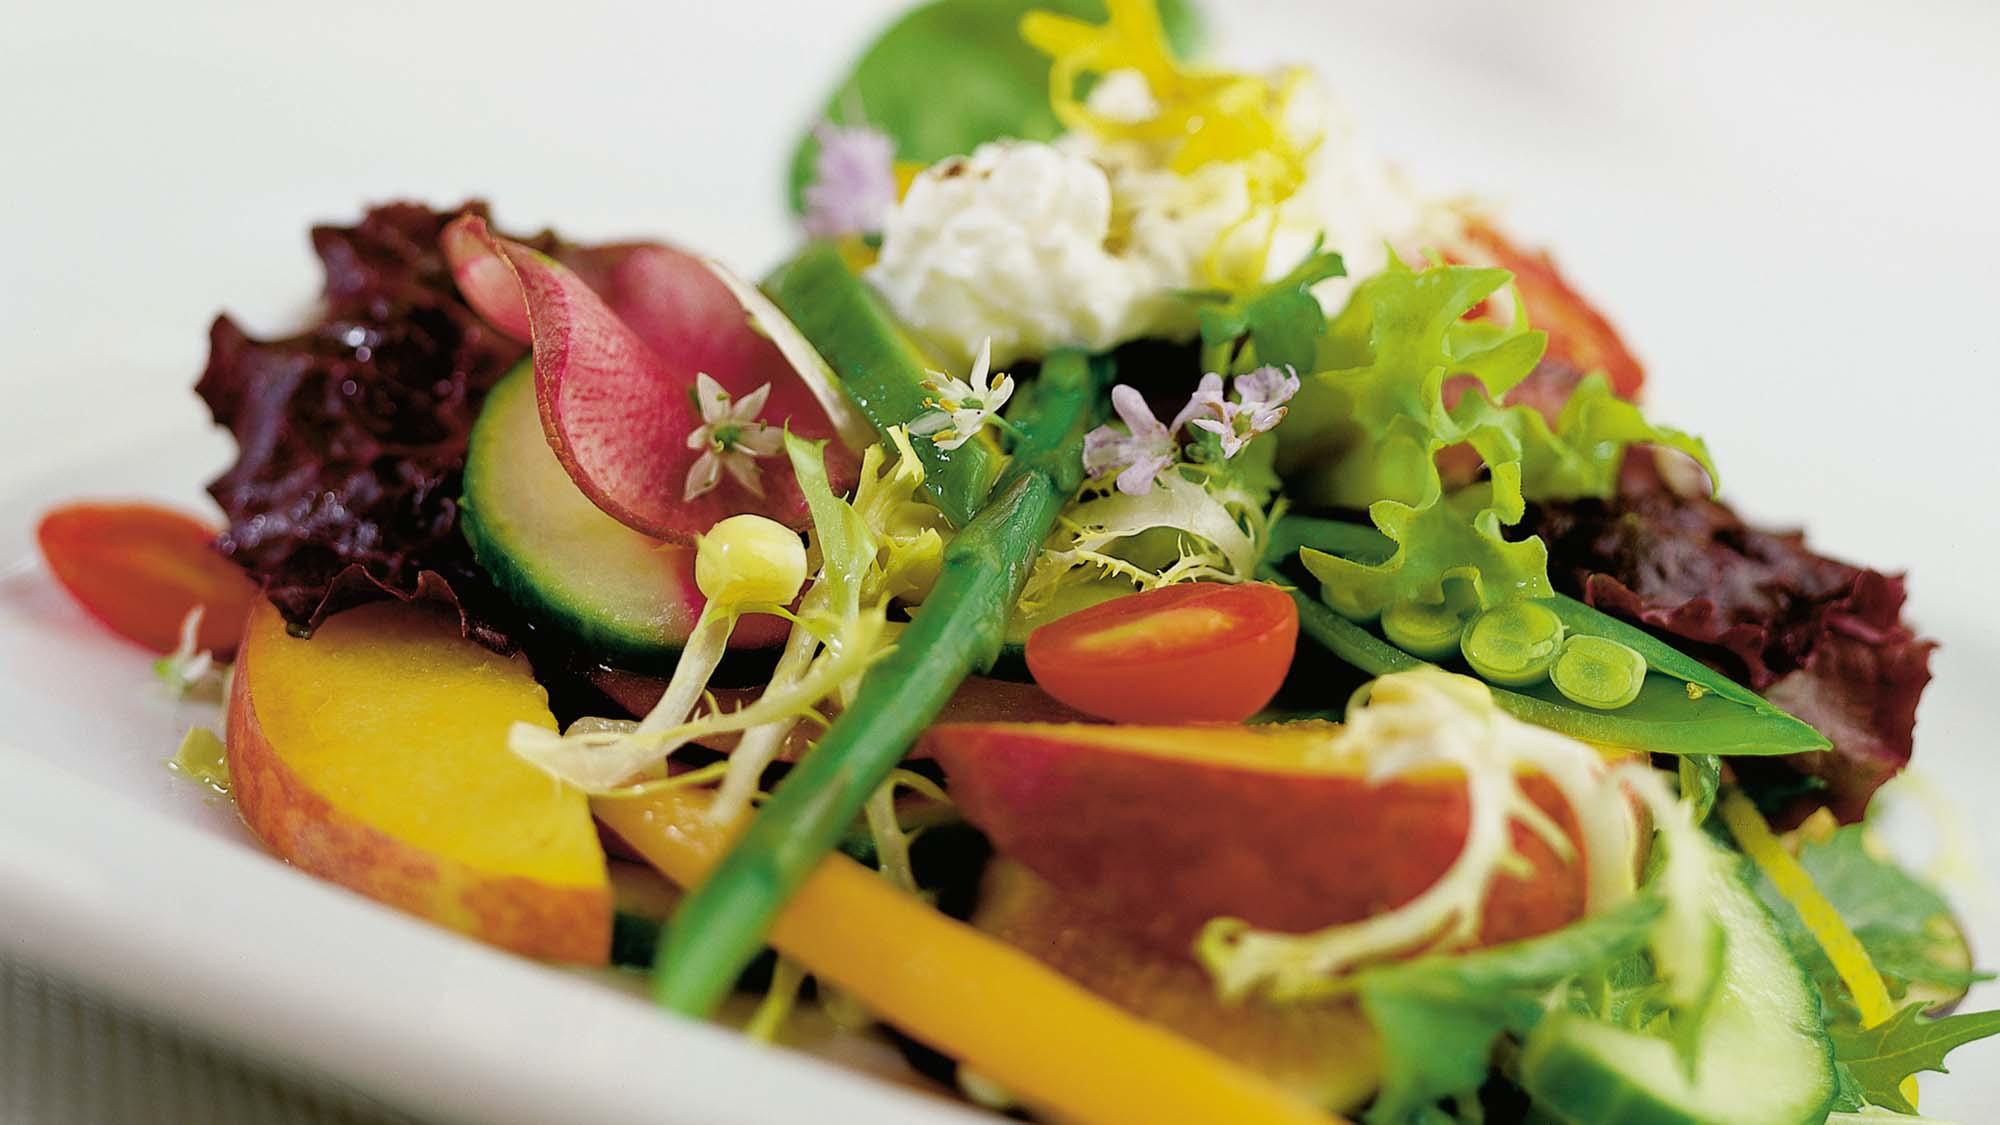 Top 10 Fine Dining Restaurants